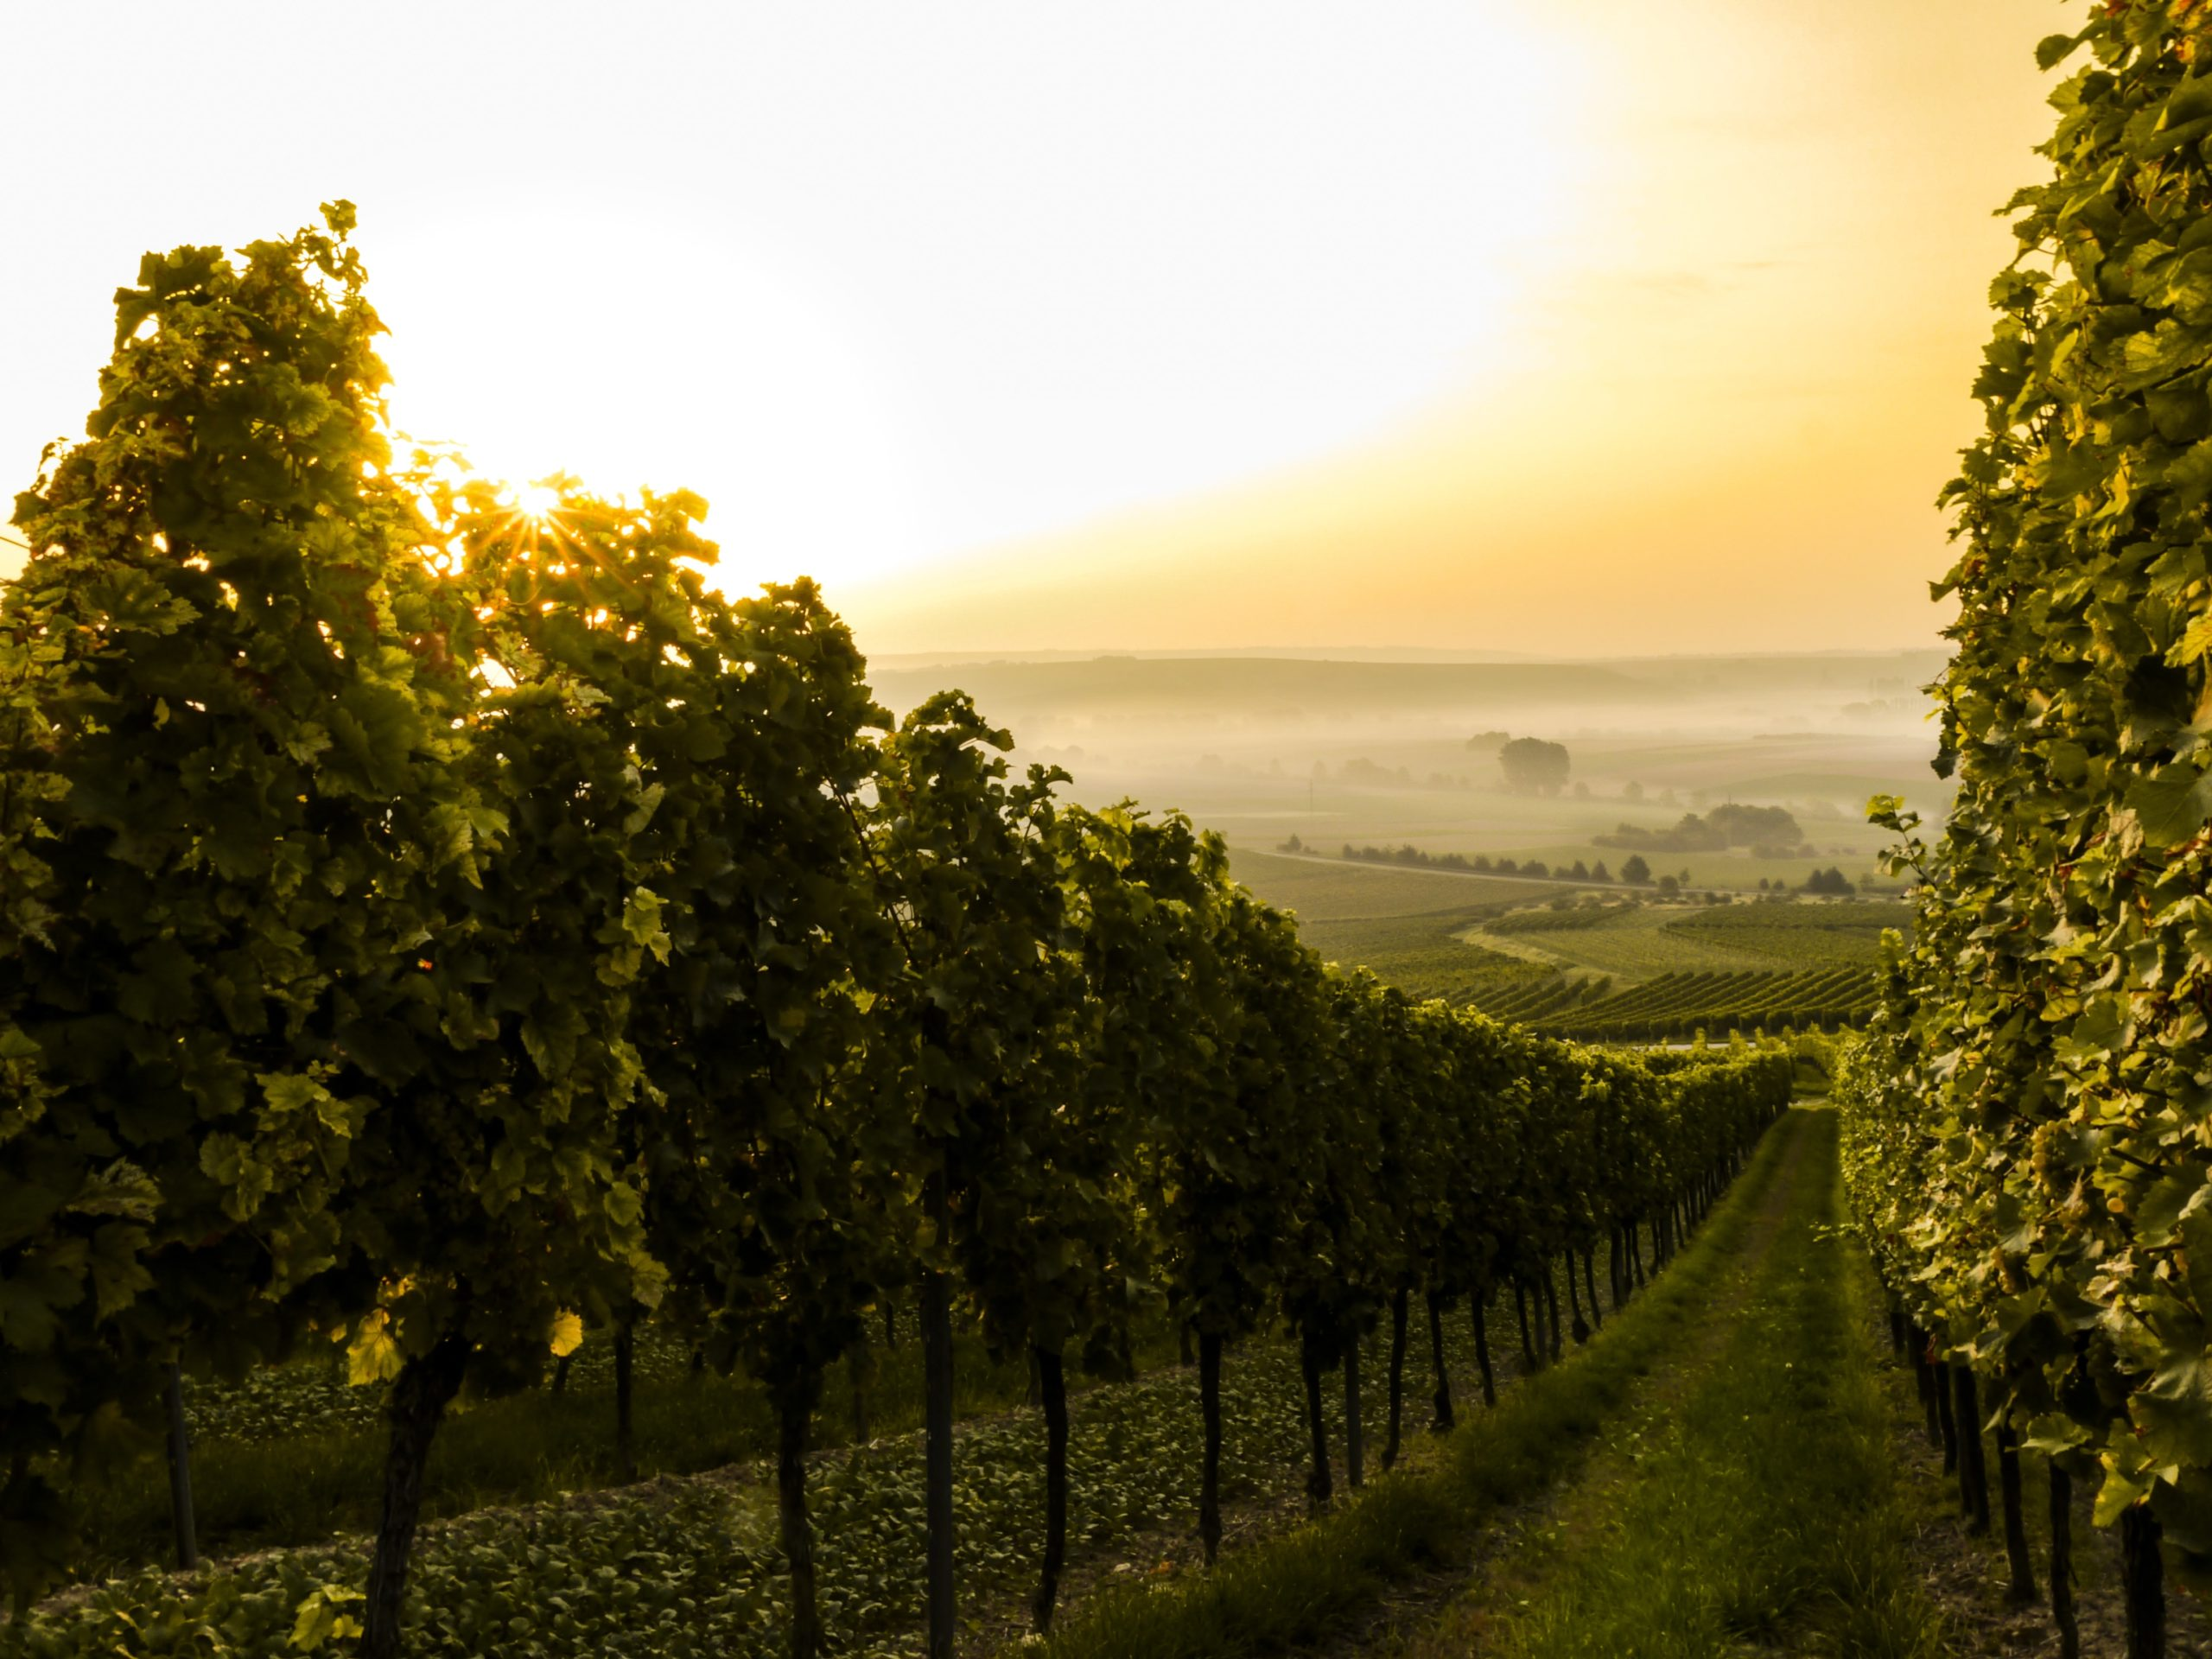 Vineyard New Zealand